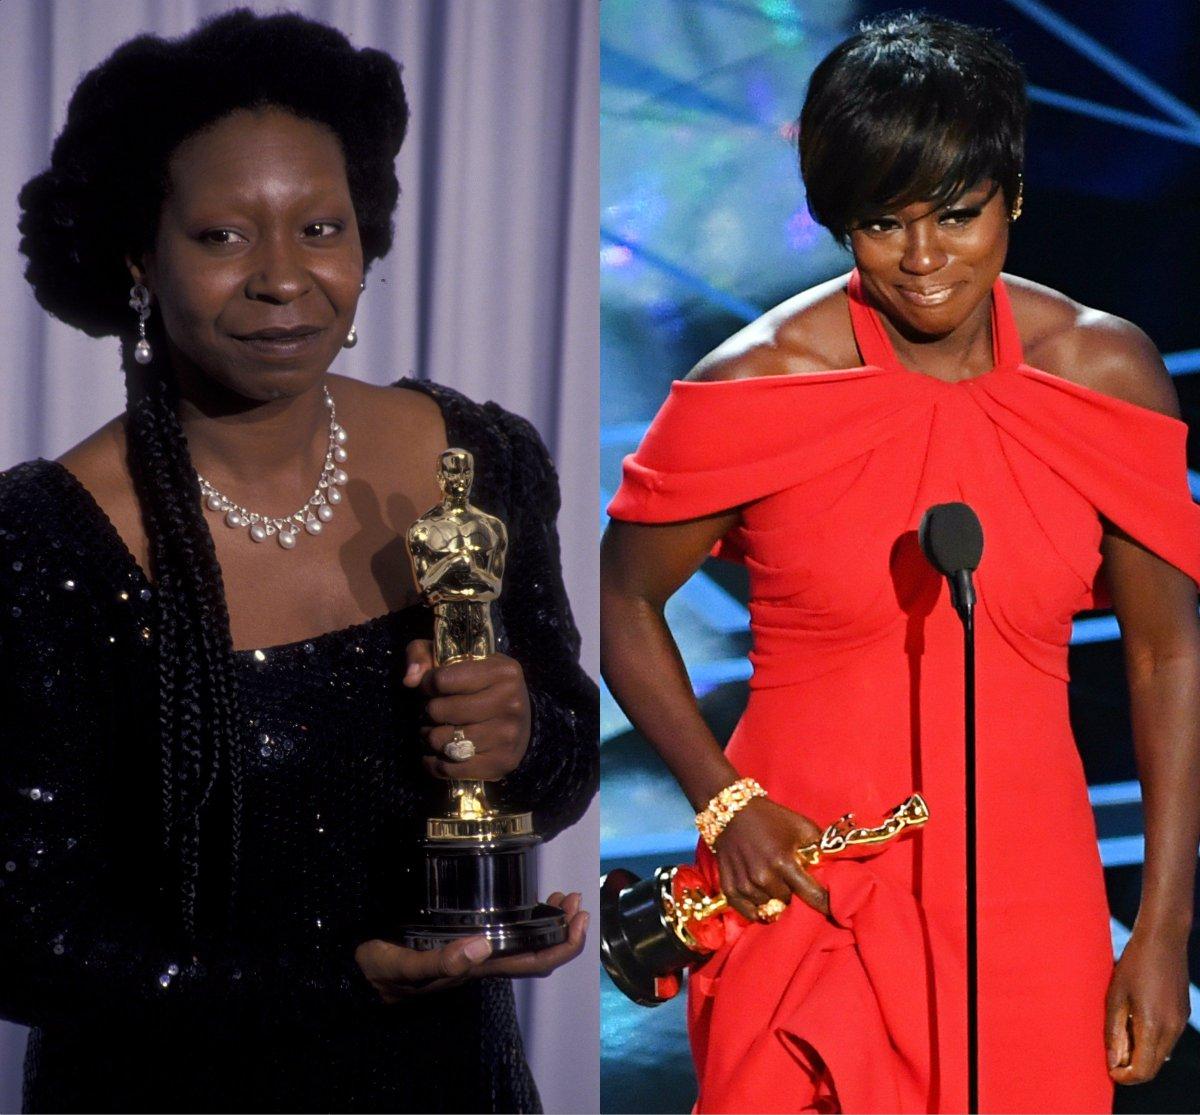 .@violadavis joins @WhoopiGoldberg as the only Black actresses to win an Oscar, a Tony and an Emmy Award. #BlackGirlMagic #Oscars